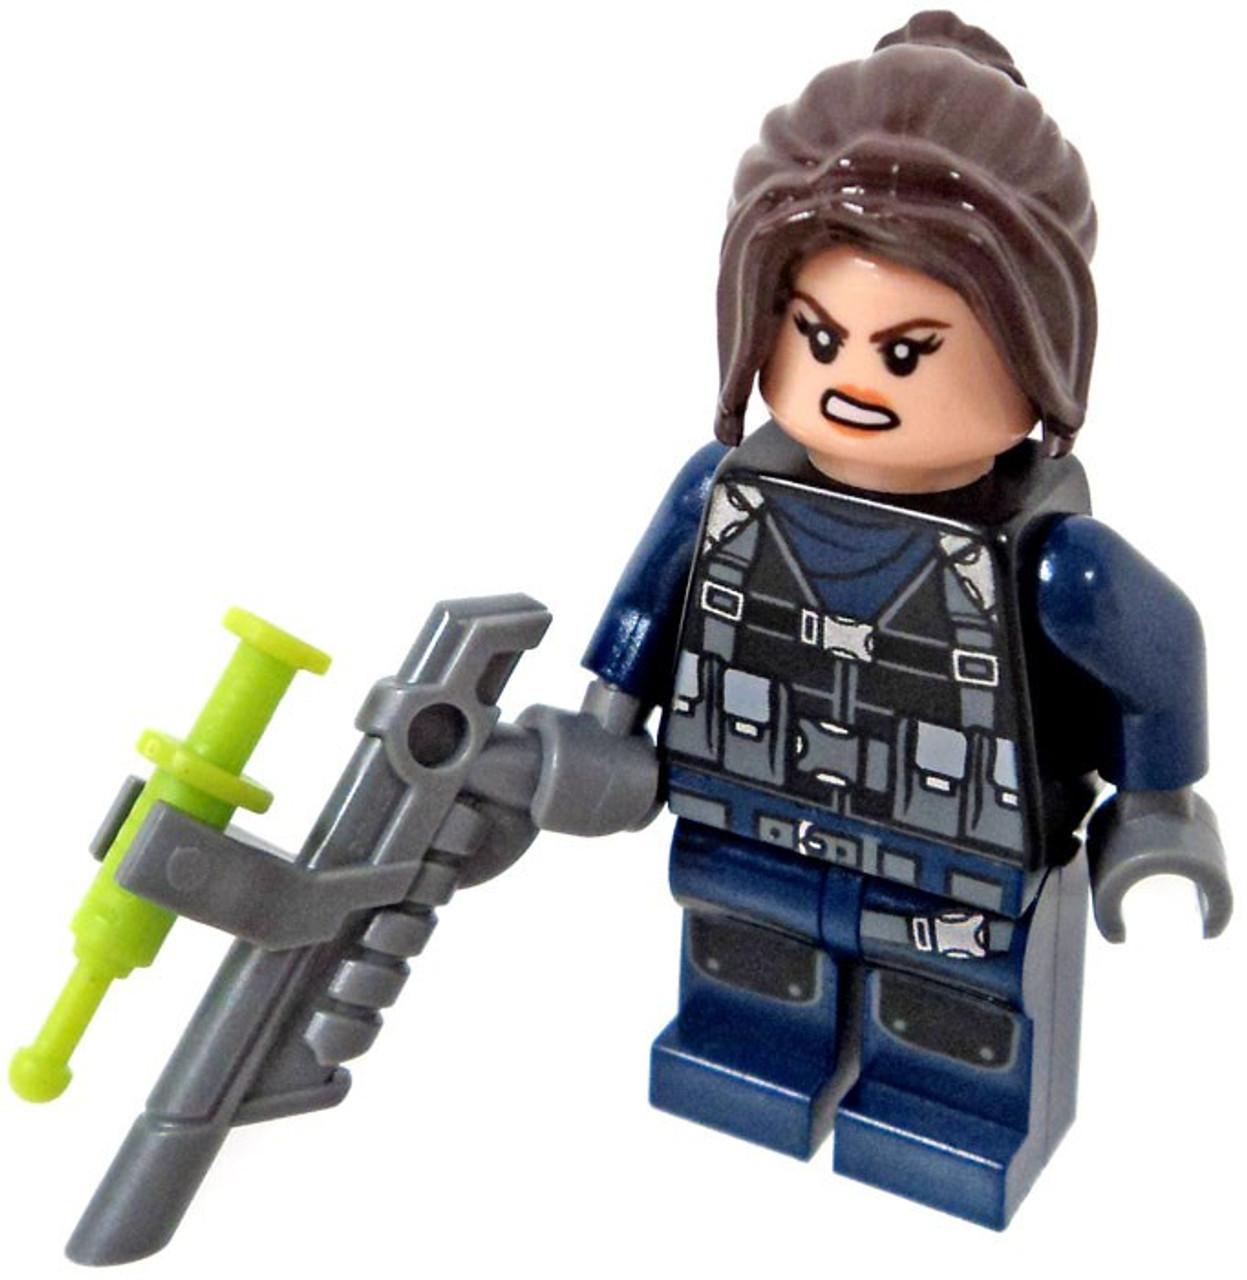 LEGO Jurassic World Fallen Kingdom Female Guard Minifigure